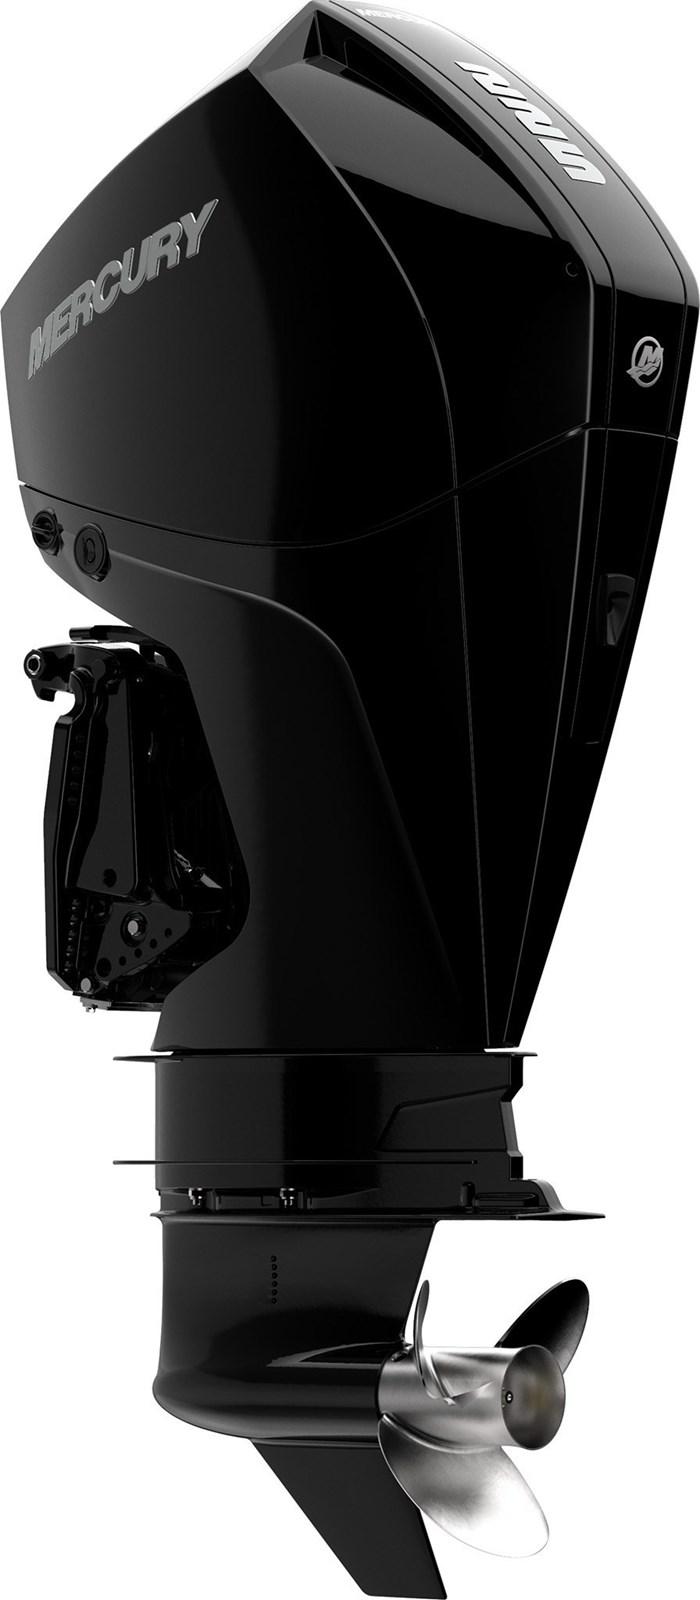 2022 Mercury 225XL V-6 4-Stroke DTS Photo 9 sur 24